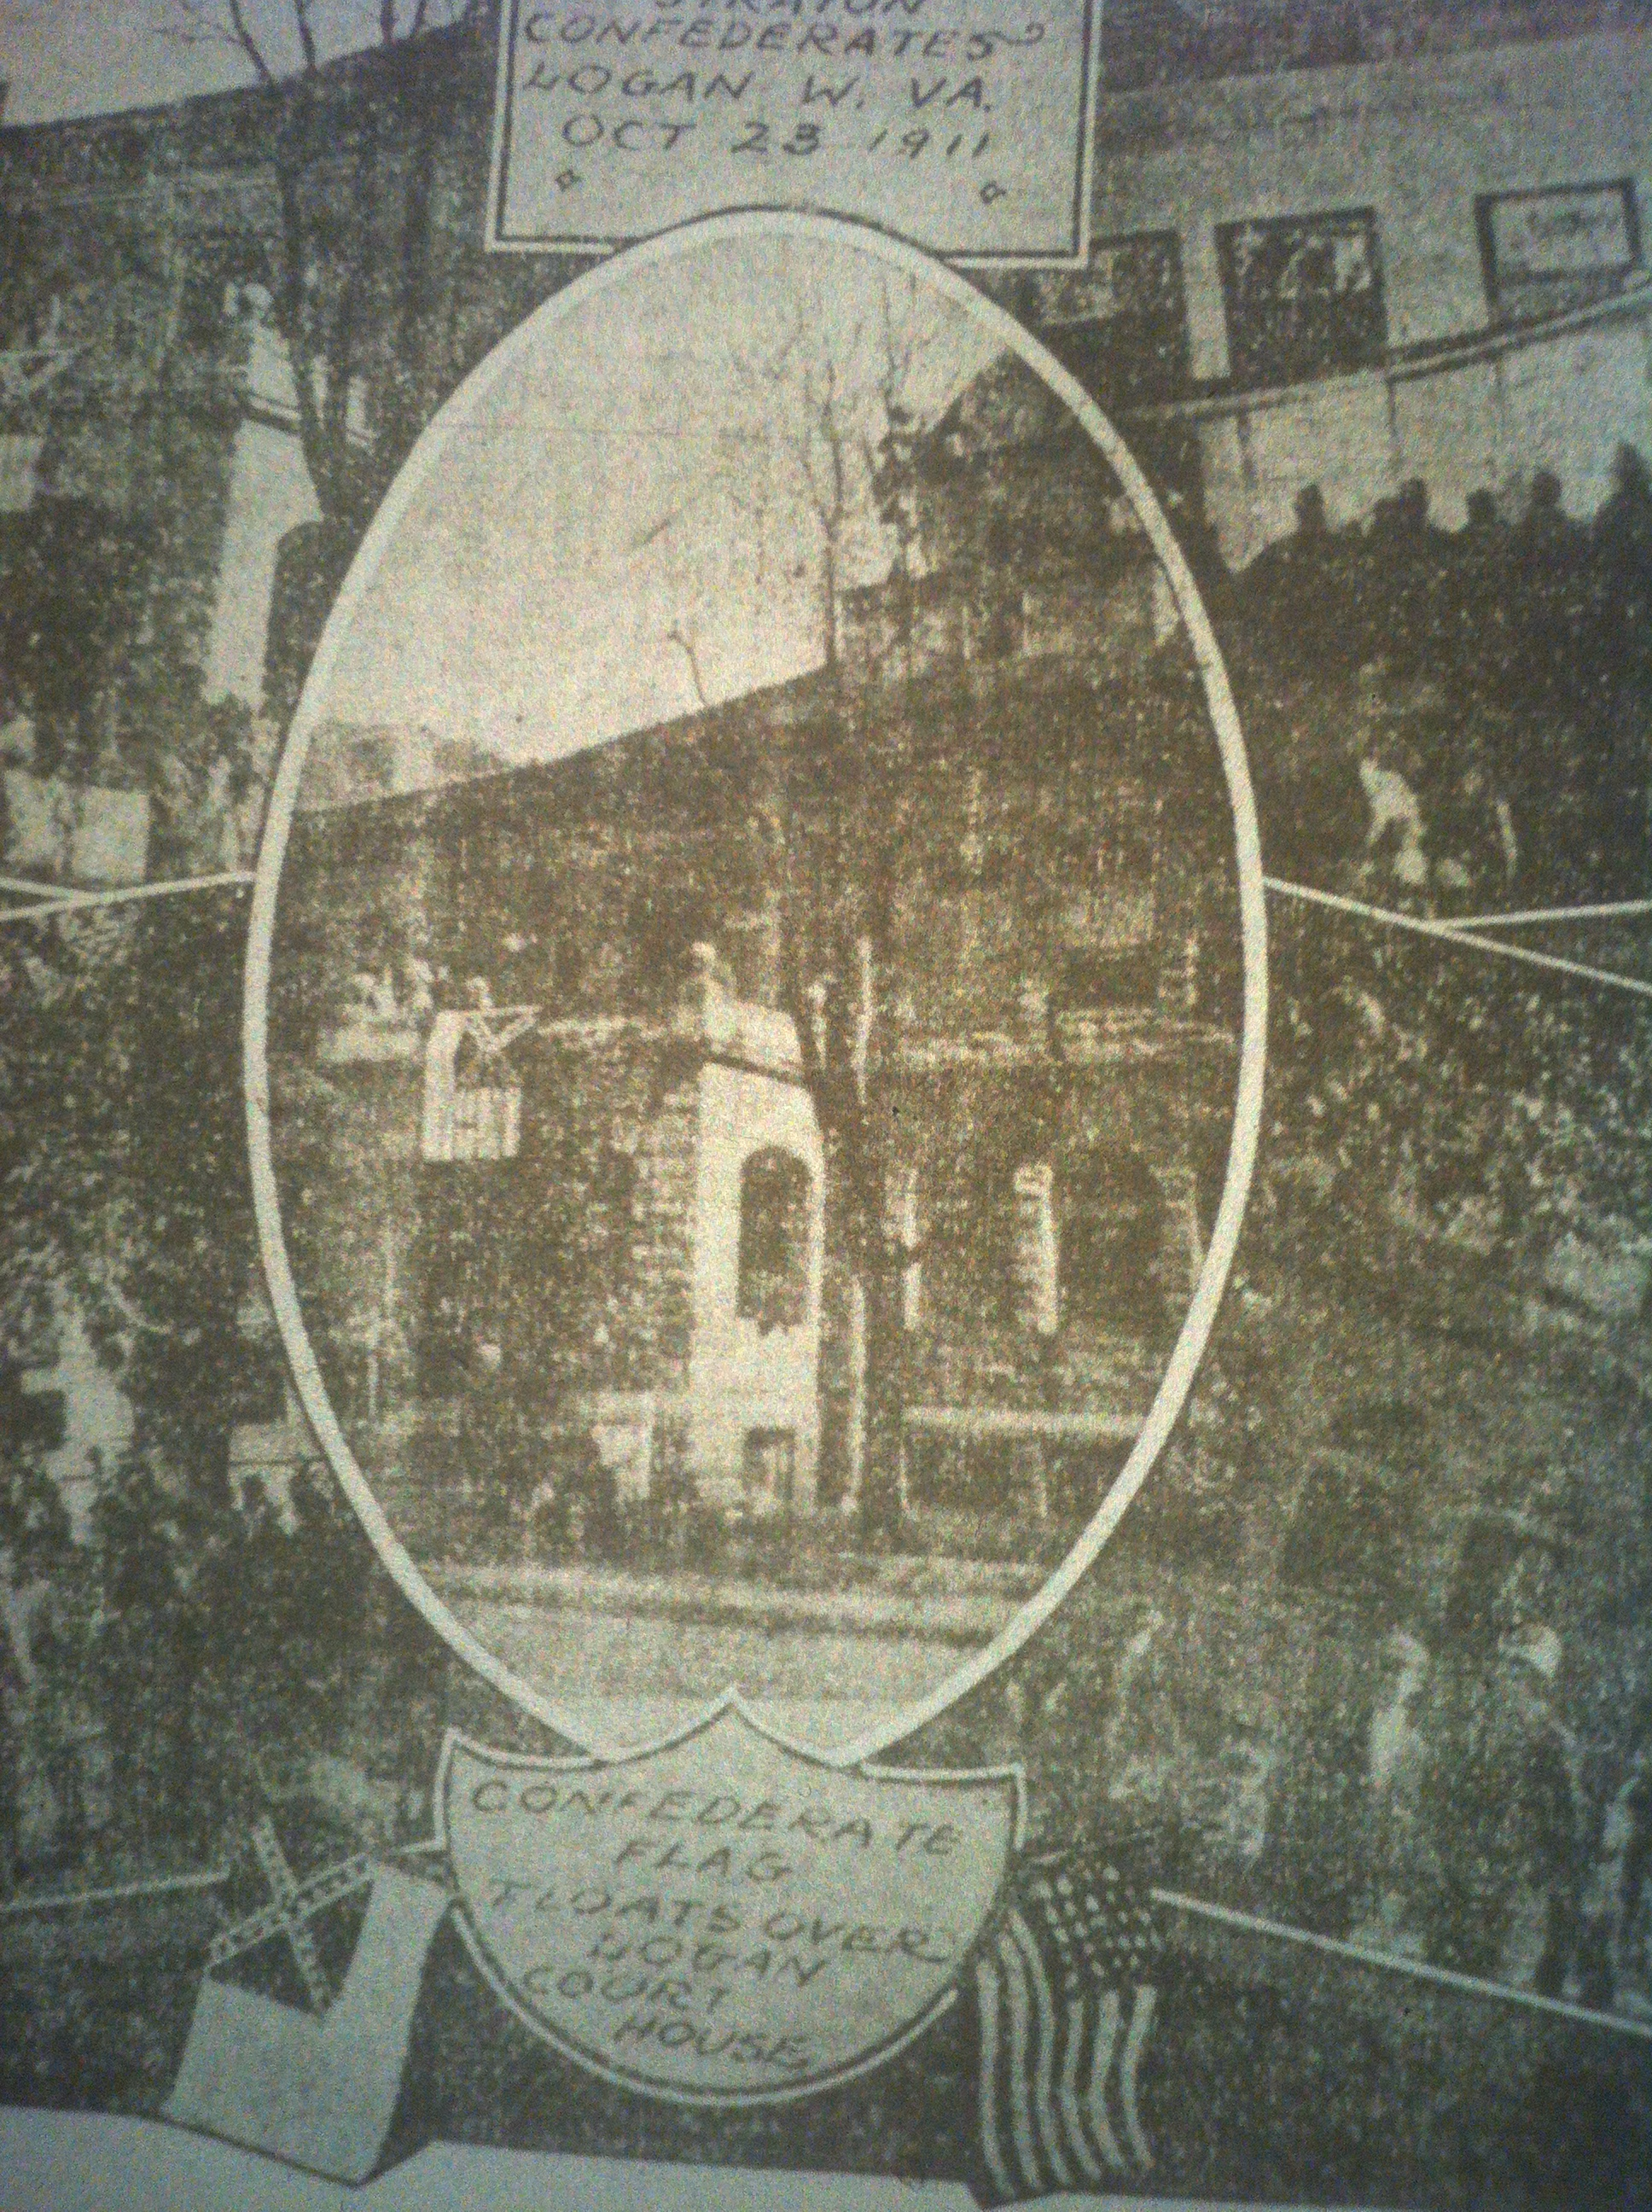 Camp Straton Reunion LB 04.24.1914 6.JPG